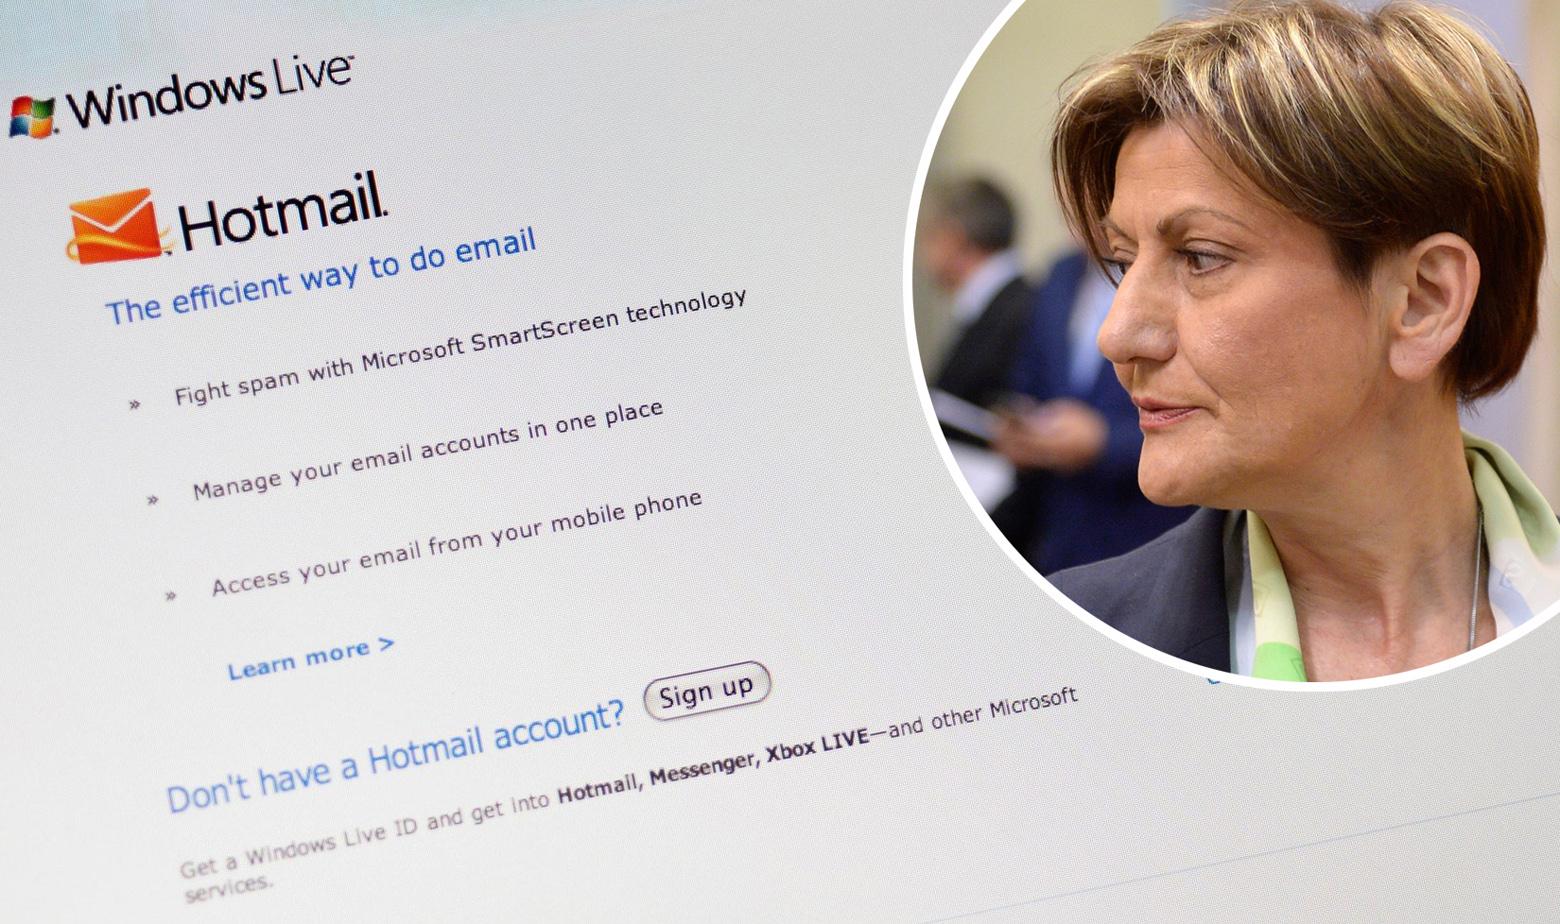 Hotmail i Martina Dalić u krugu